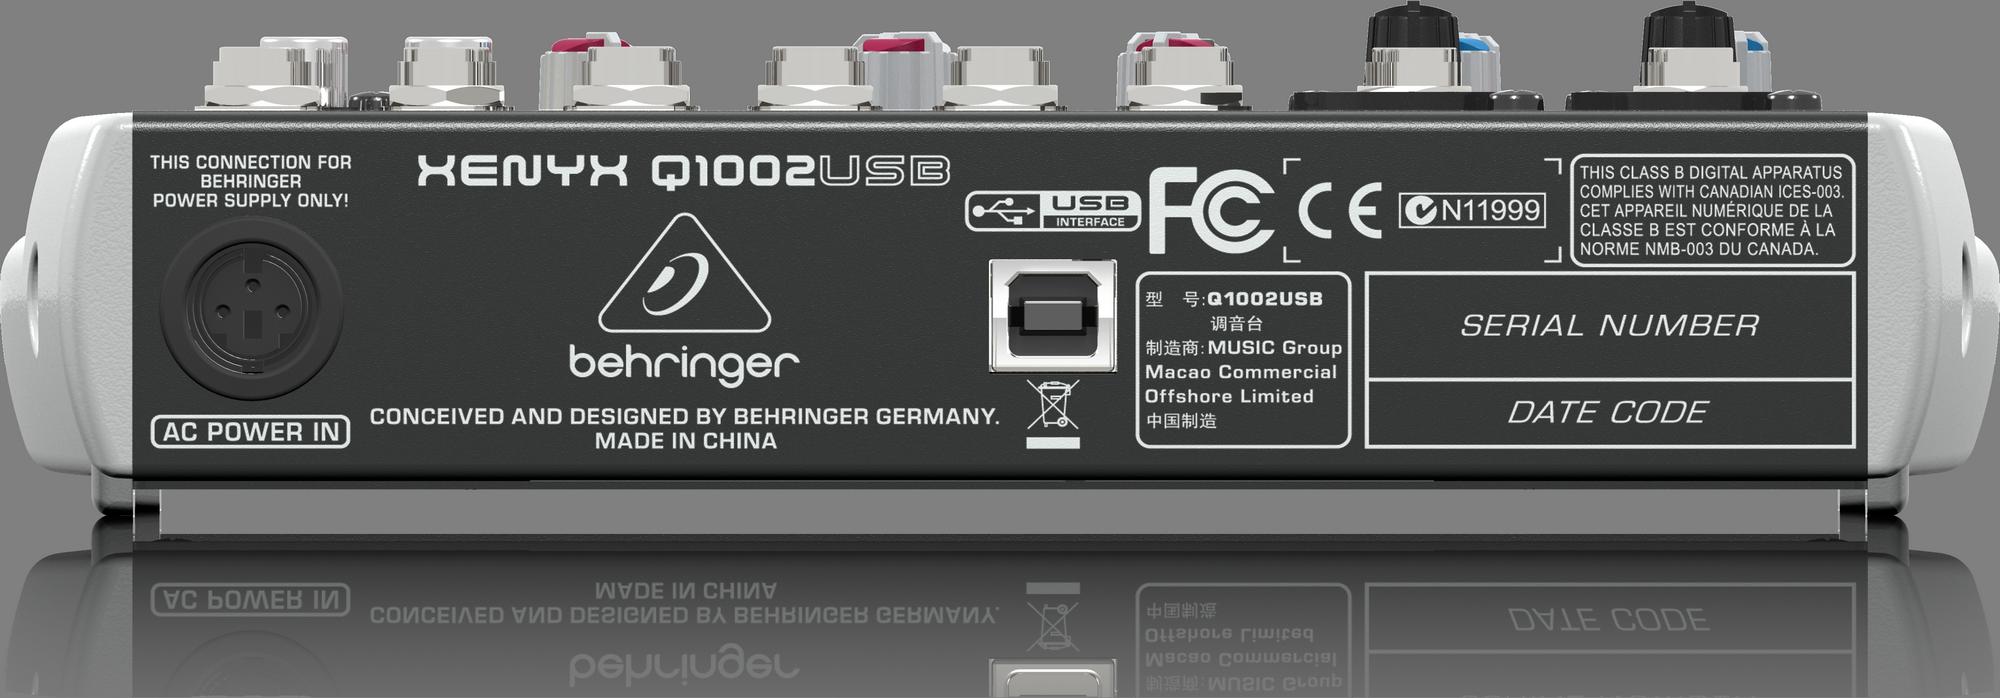 Behringer Q1002USB - console